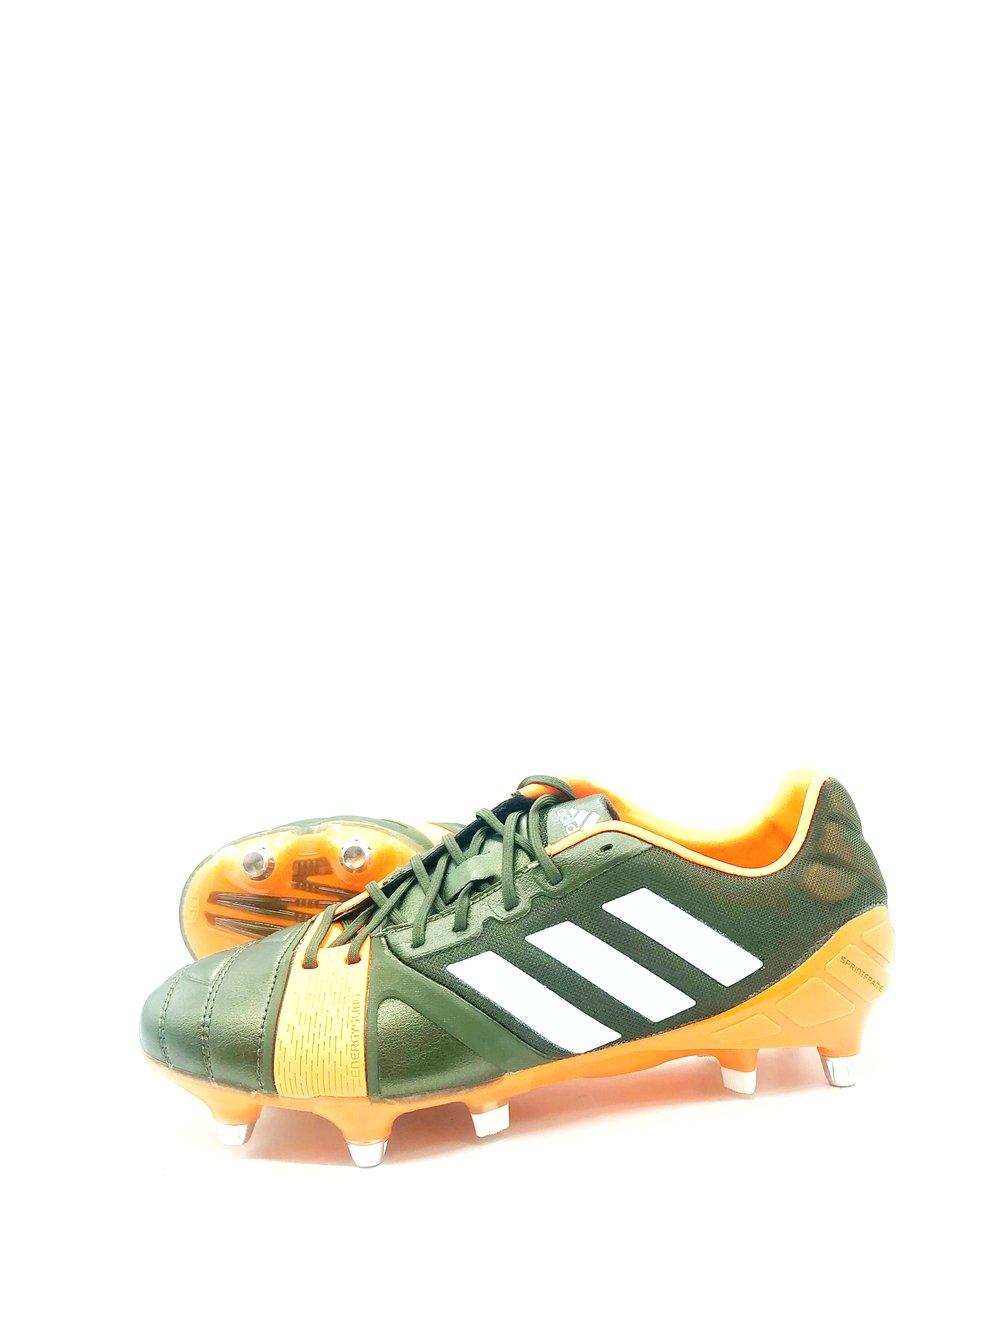 Image of Adidas nitrocharge 1.0 SG green